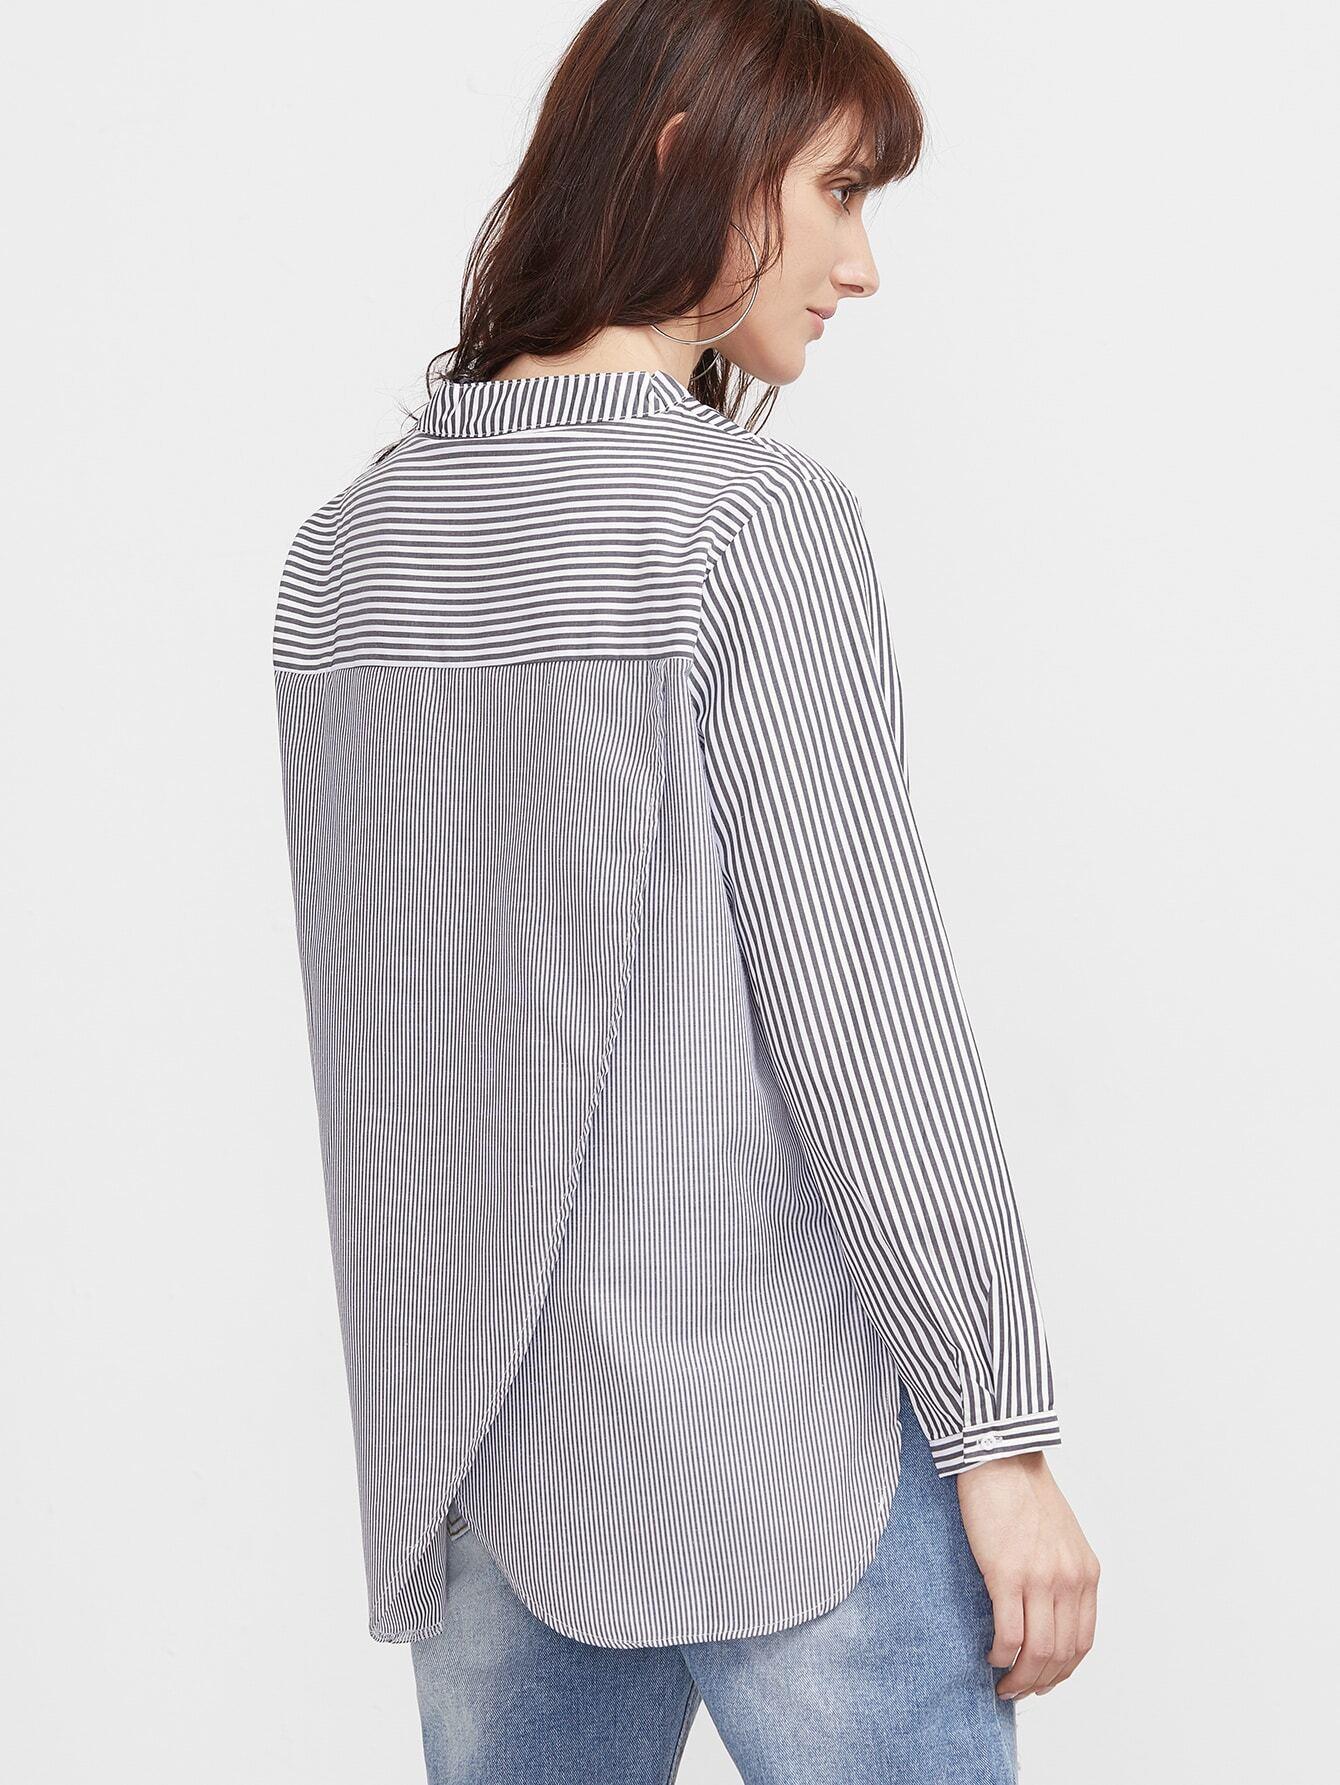 Contrast Striped Slit Side Wrap Back High Low Blouse blouse161216001